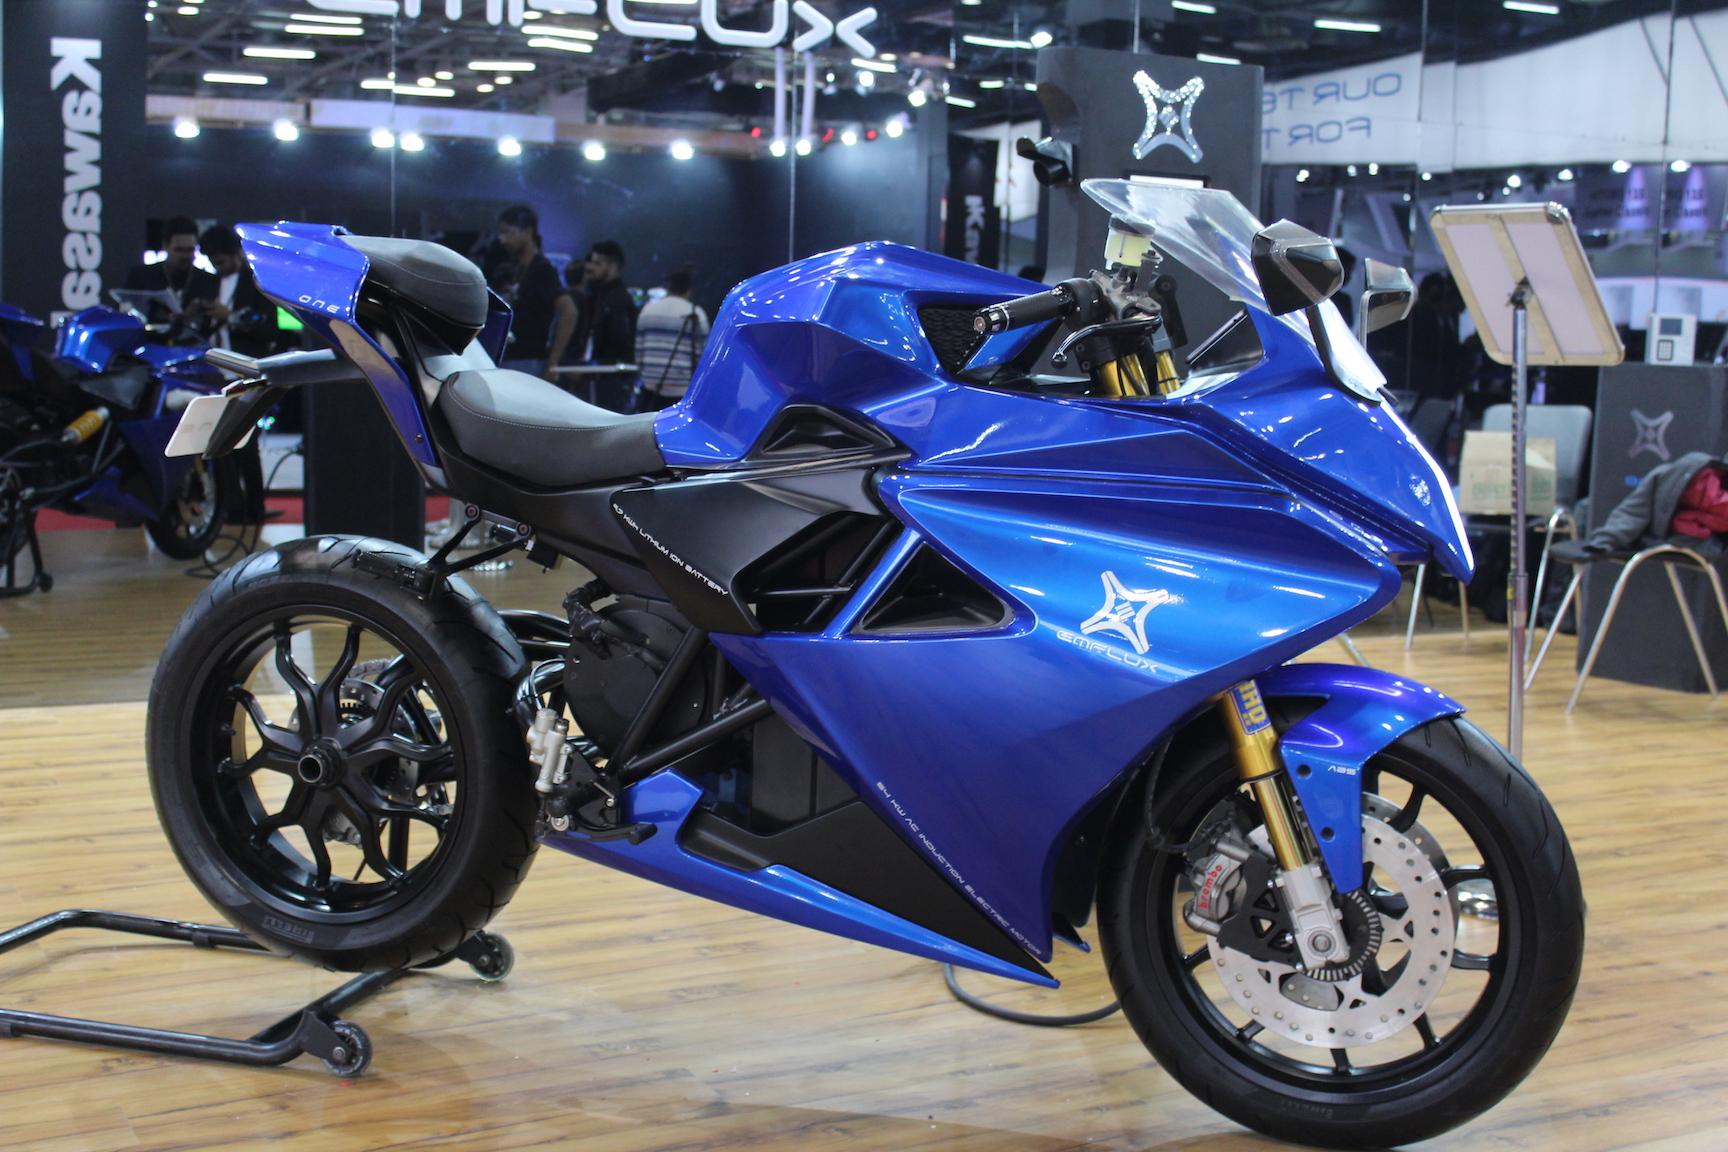 EMFLUX ELECTRIC MOTORCYCLE